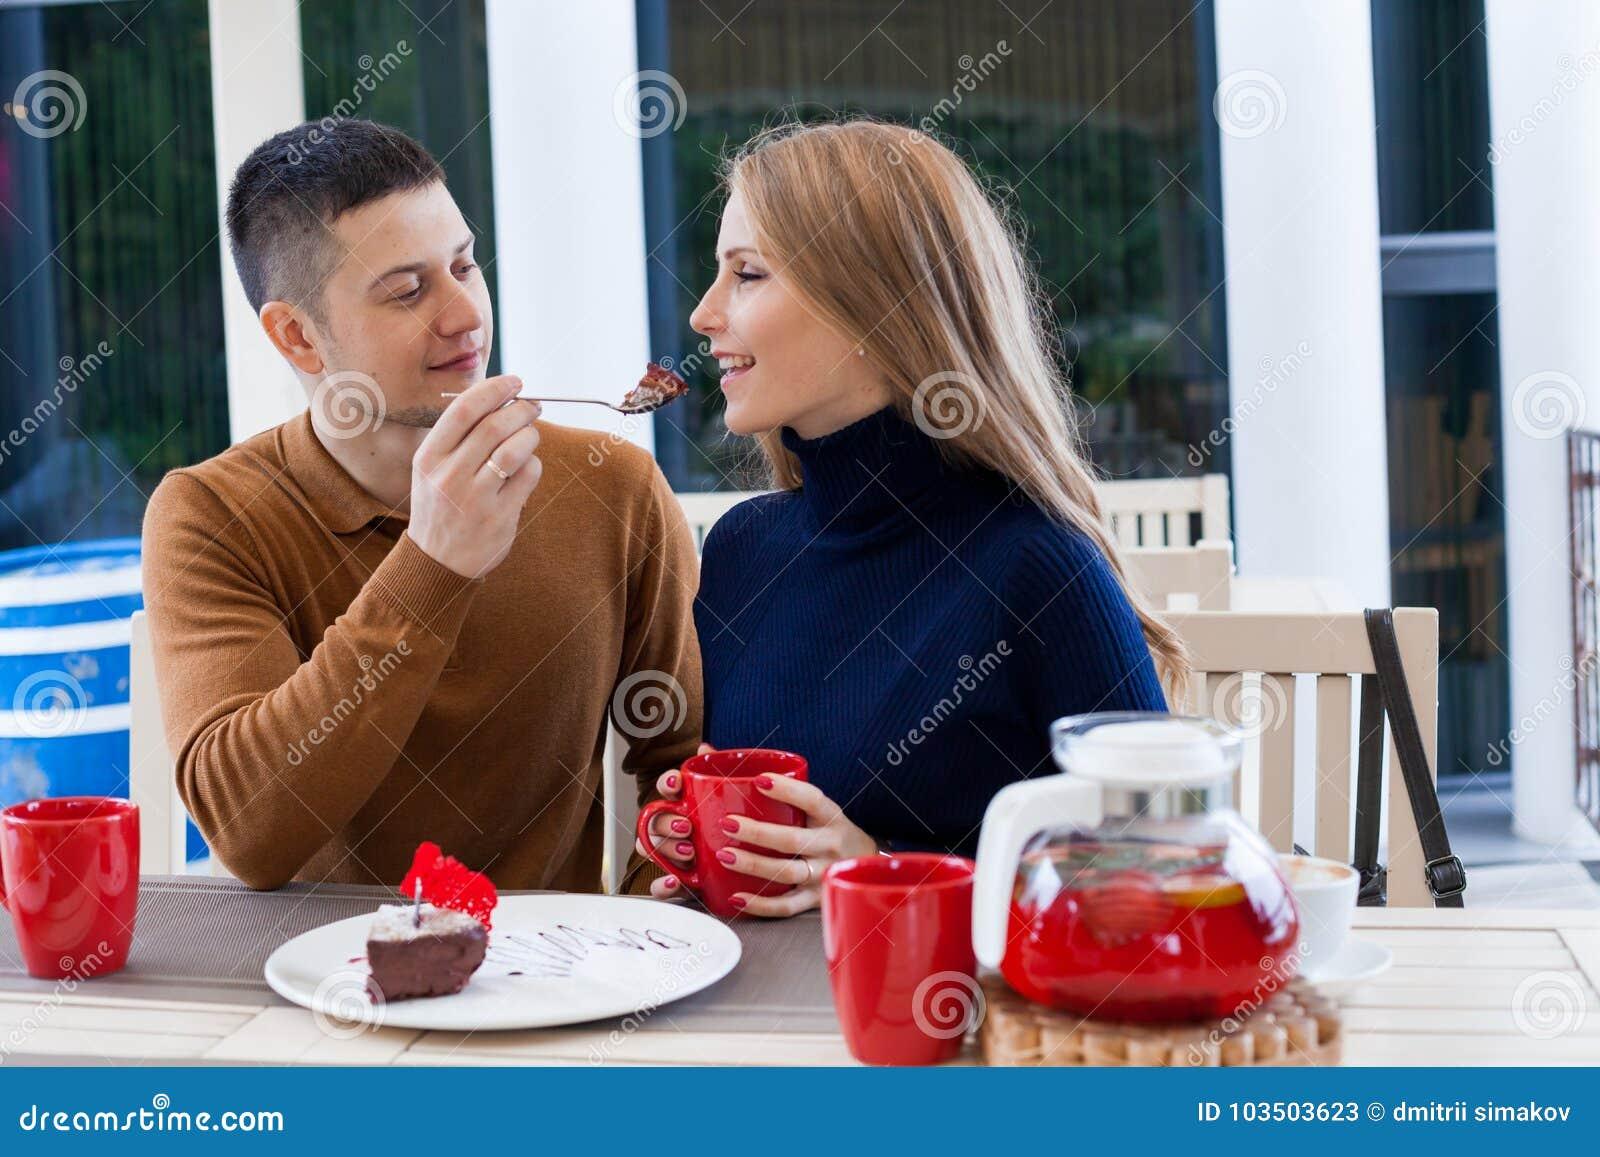 Bdsm italian husband wife-8738